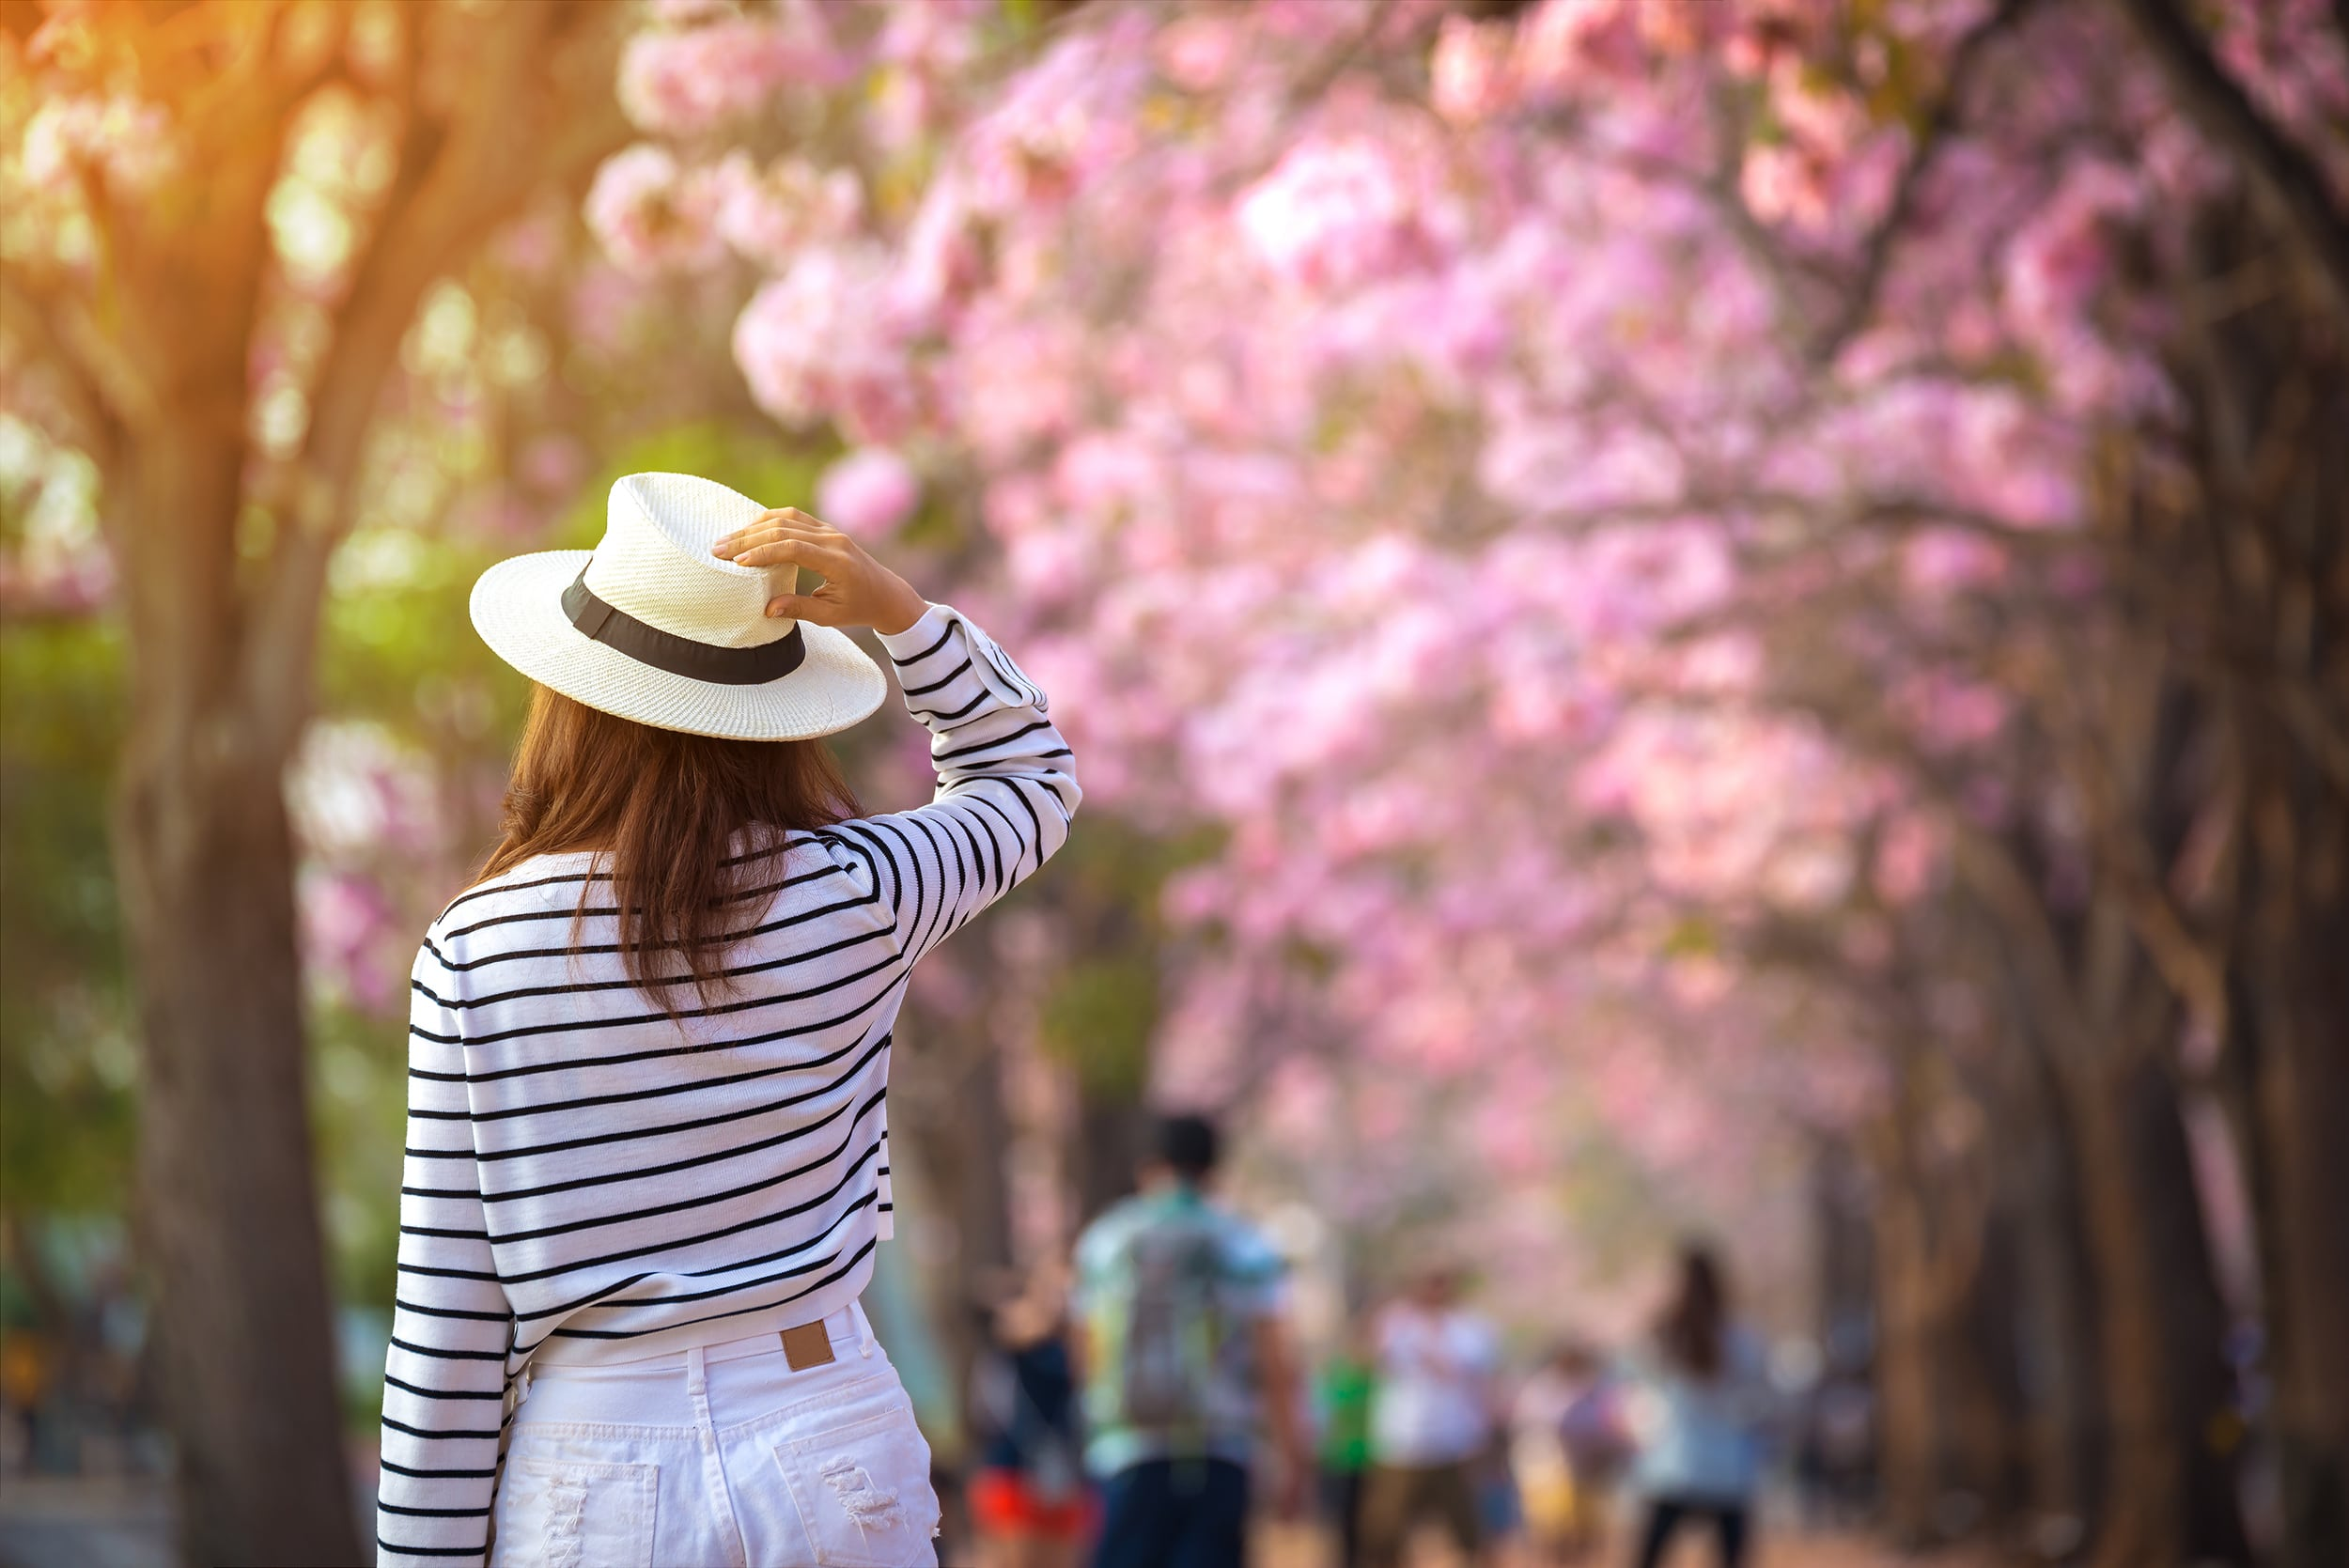 Walking though cherry blossom trees in Washington, DC